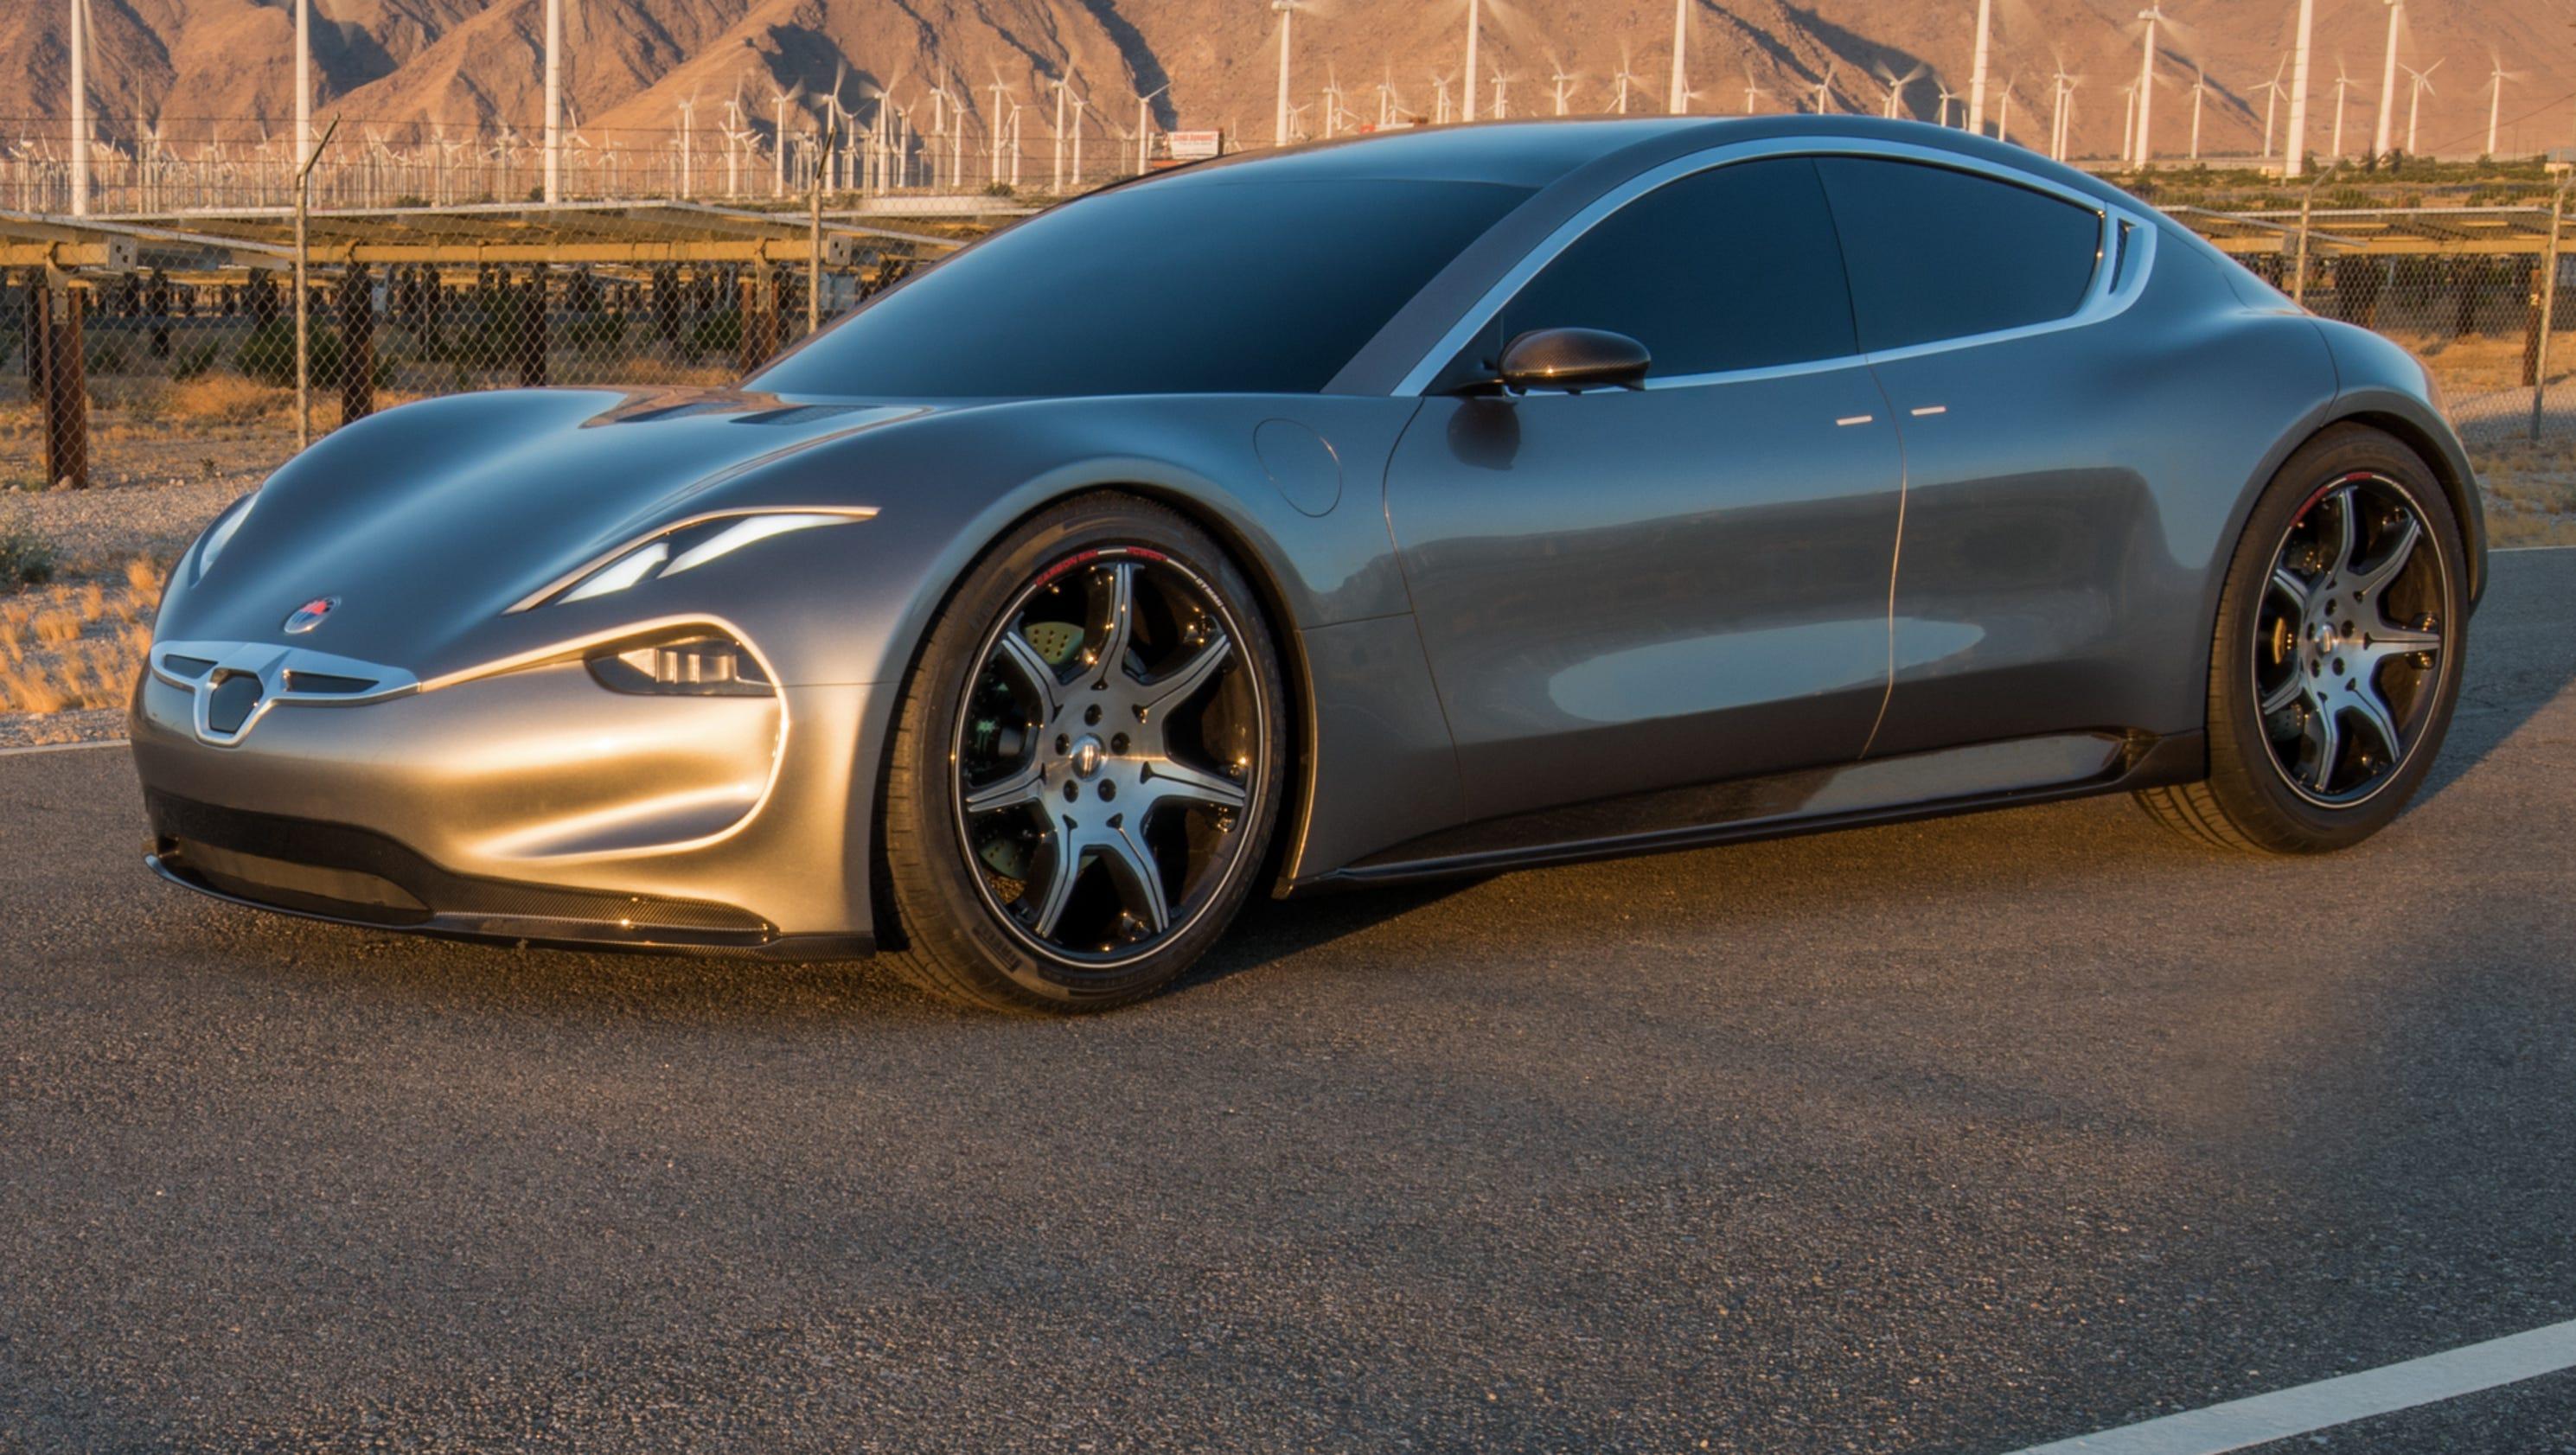 Fisker returns with EMotion electric car